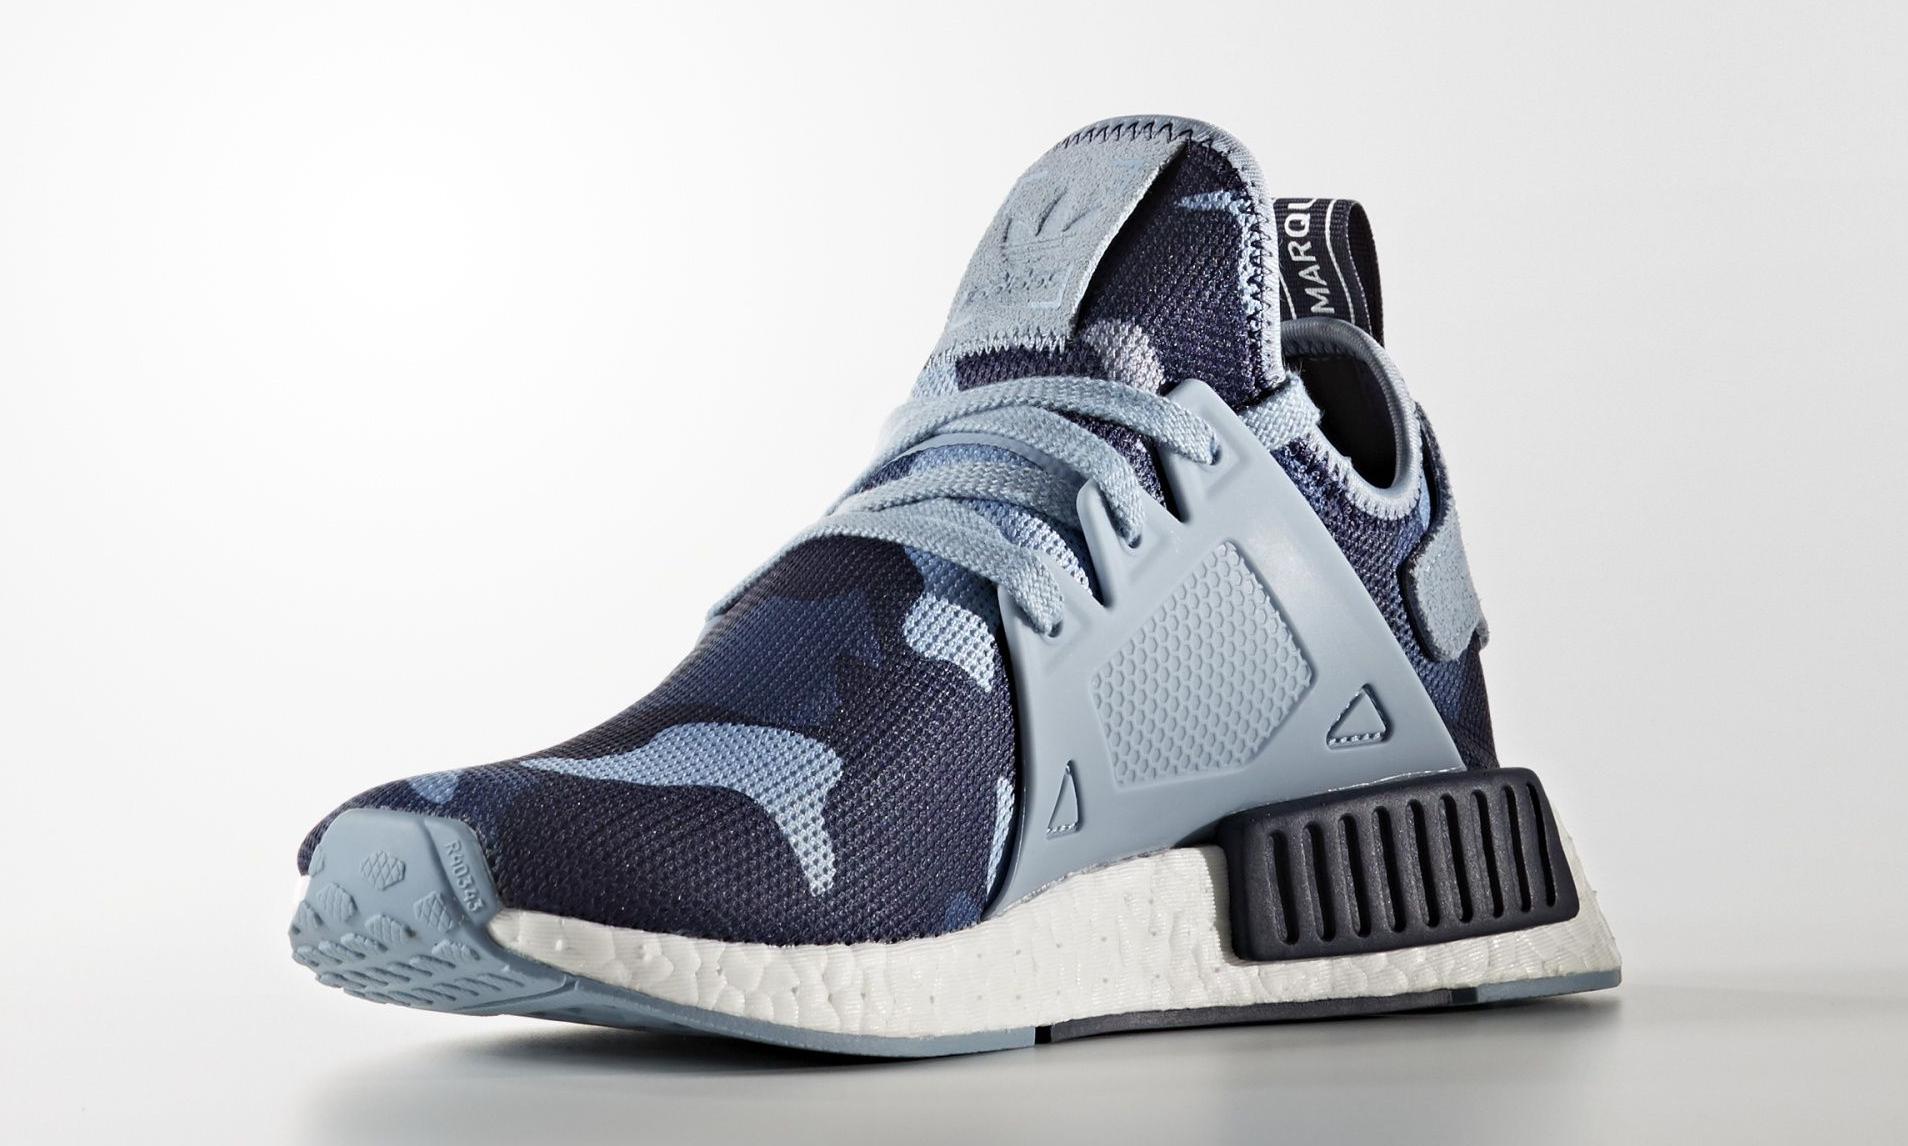 official photos 4033e 0f3be Blue Camo Adidas NMD XR1 | Sole Collector